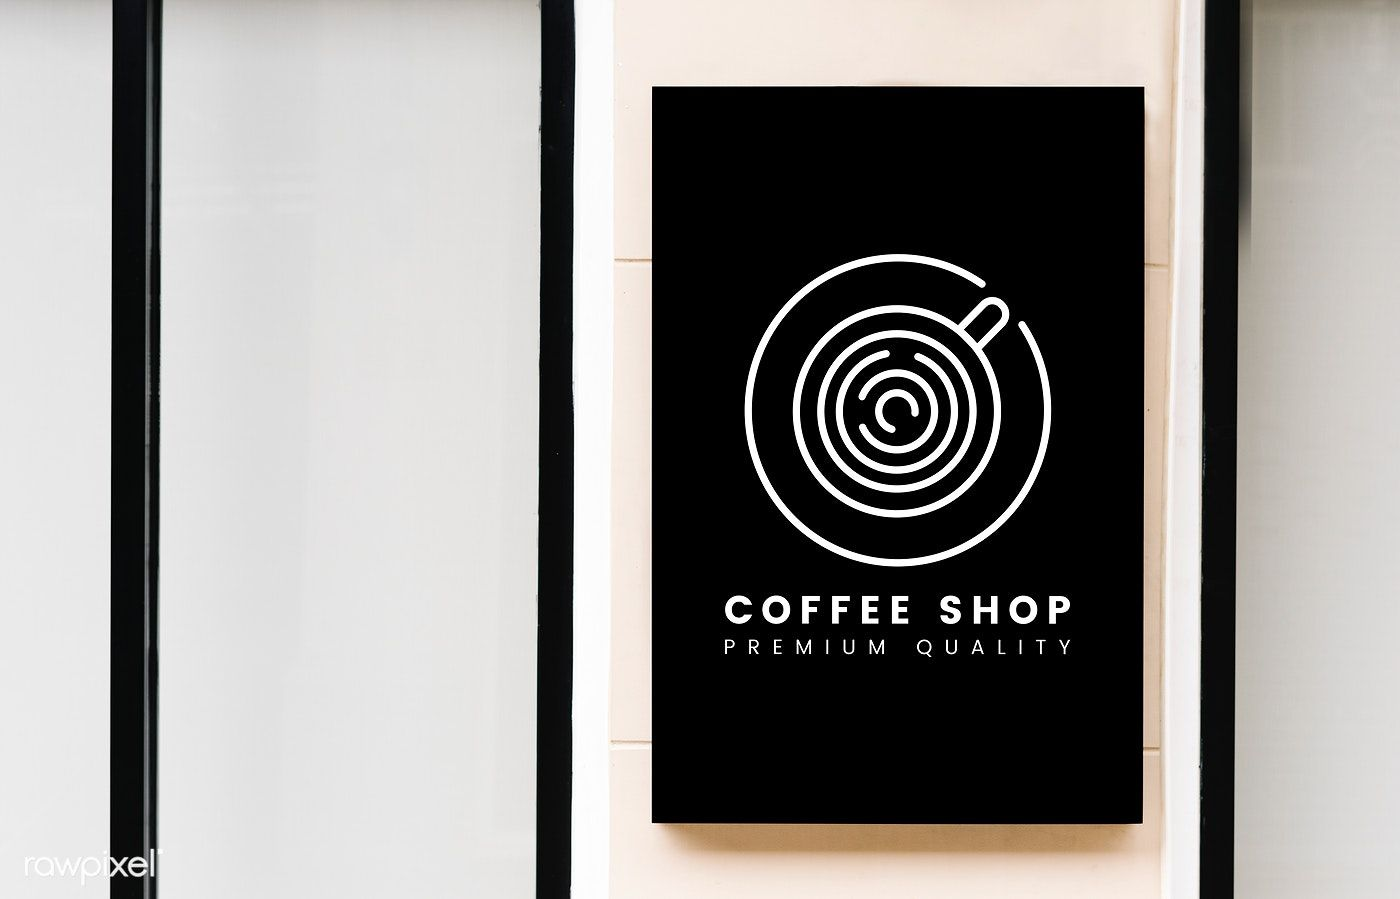 Minimal Coffee Shop Sign Mockup Free Image By Rawpixel Com Jira [ 899 x 1400 Pixel ]